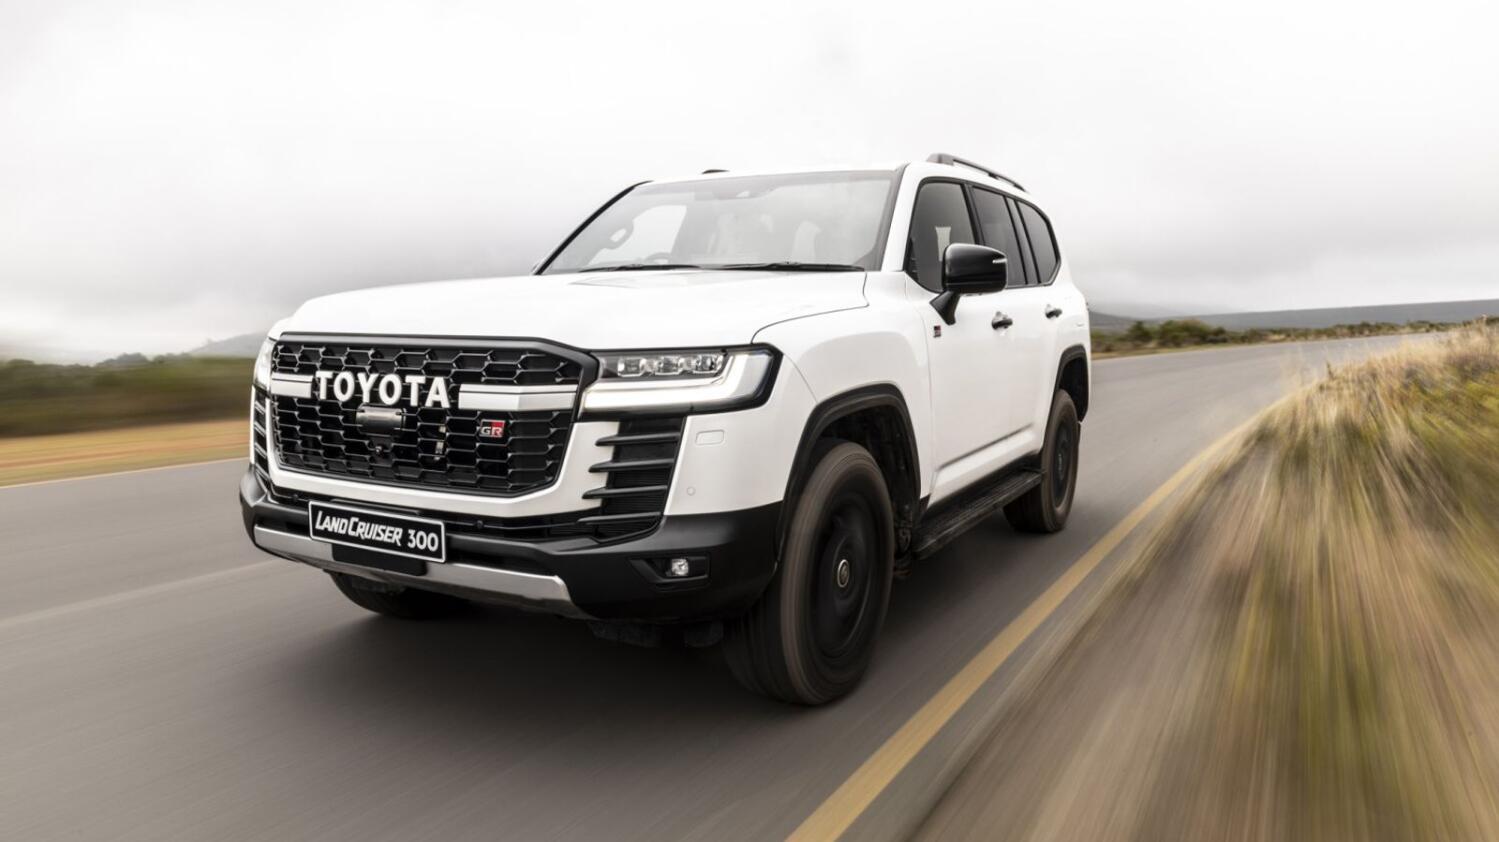 2021 Toyota Land Cruiser 300 GR-S